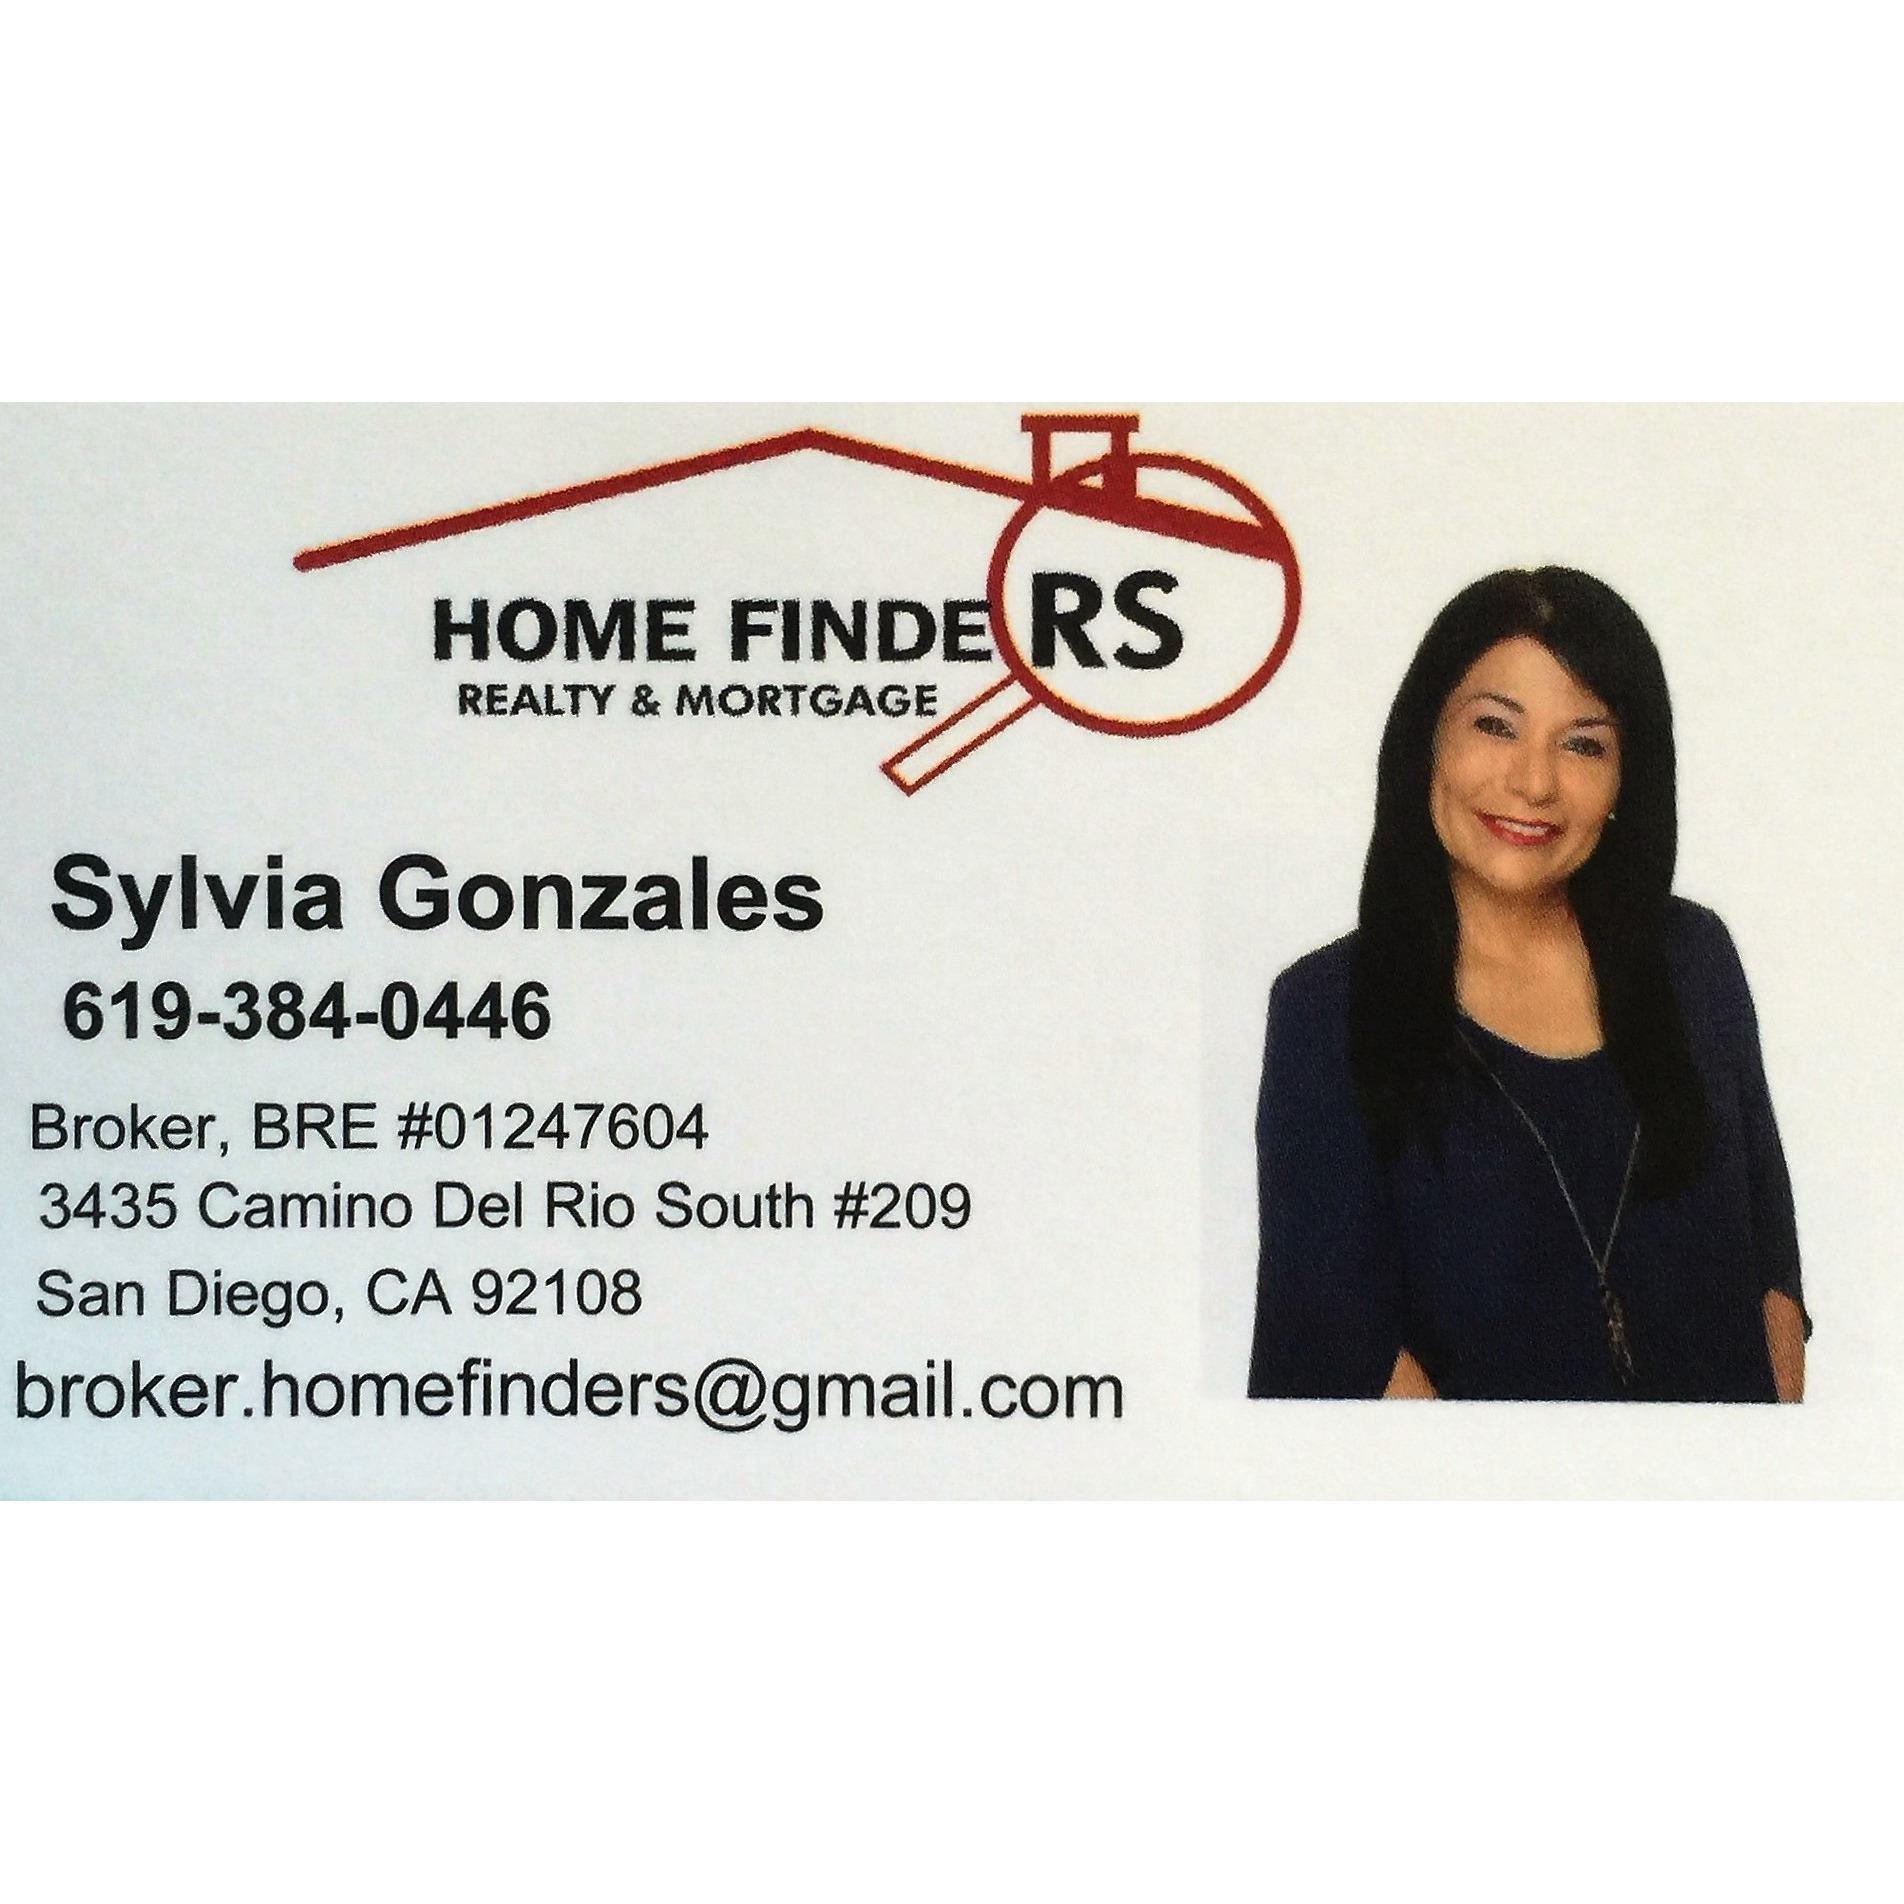 Sylvia Gonzales, Owner/Broker of Home Finders Realty